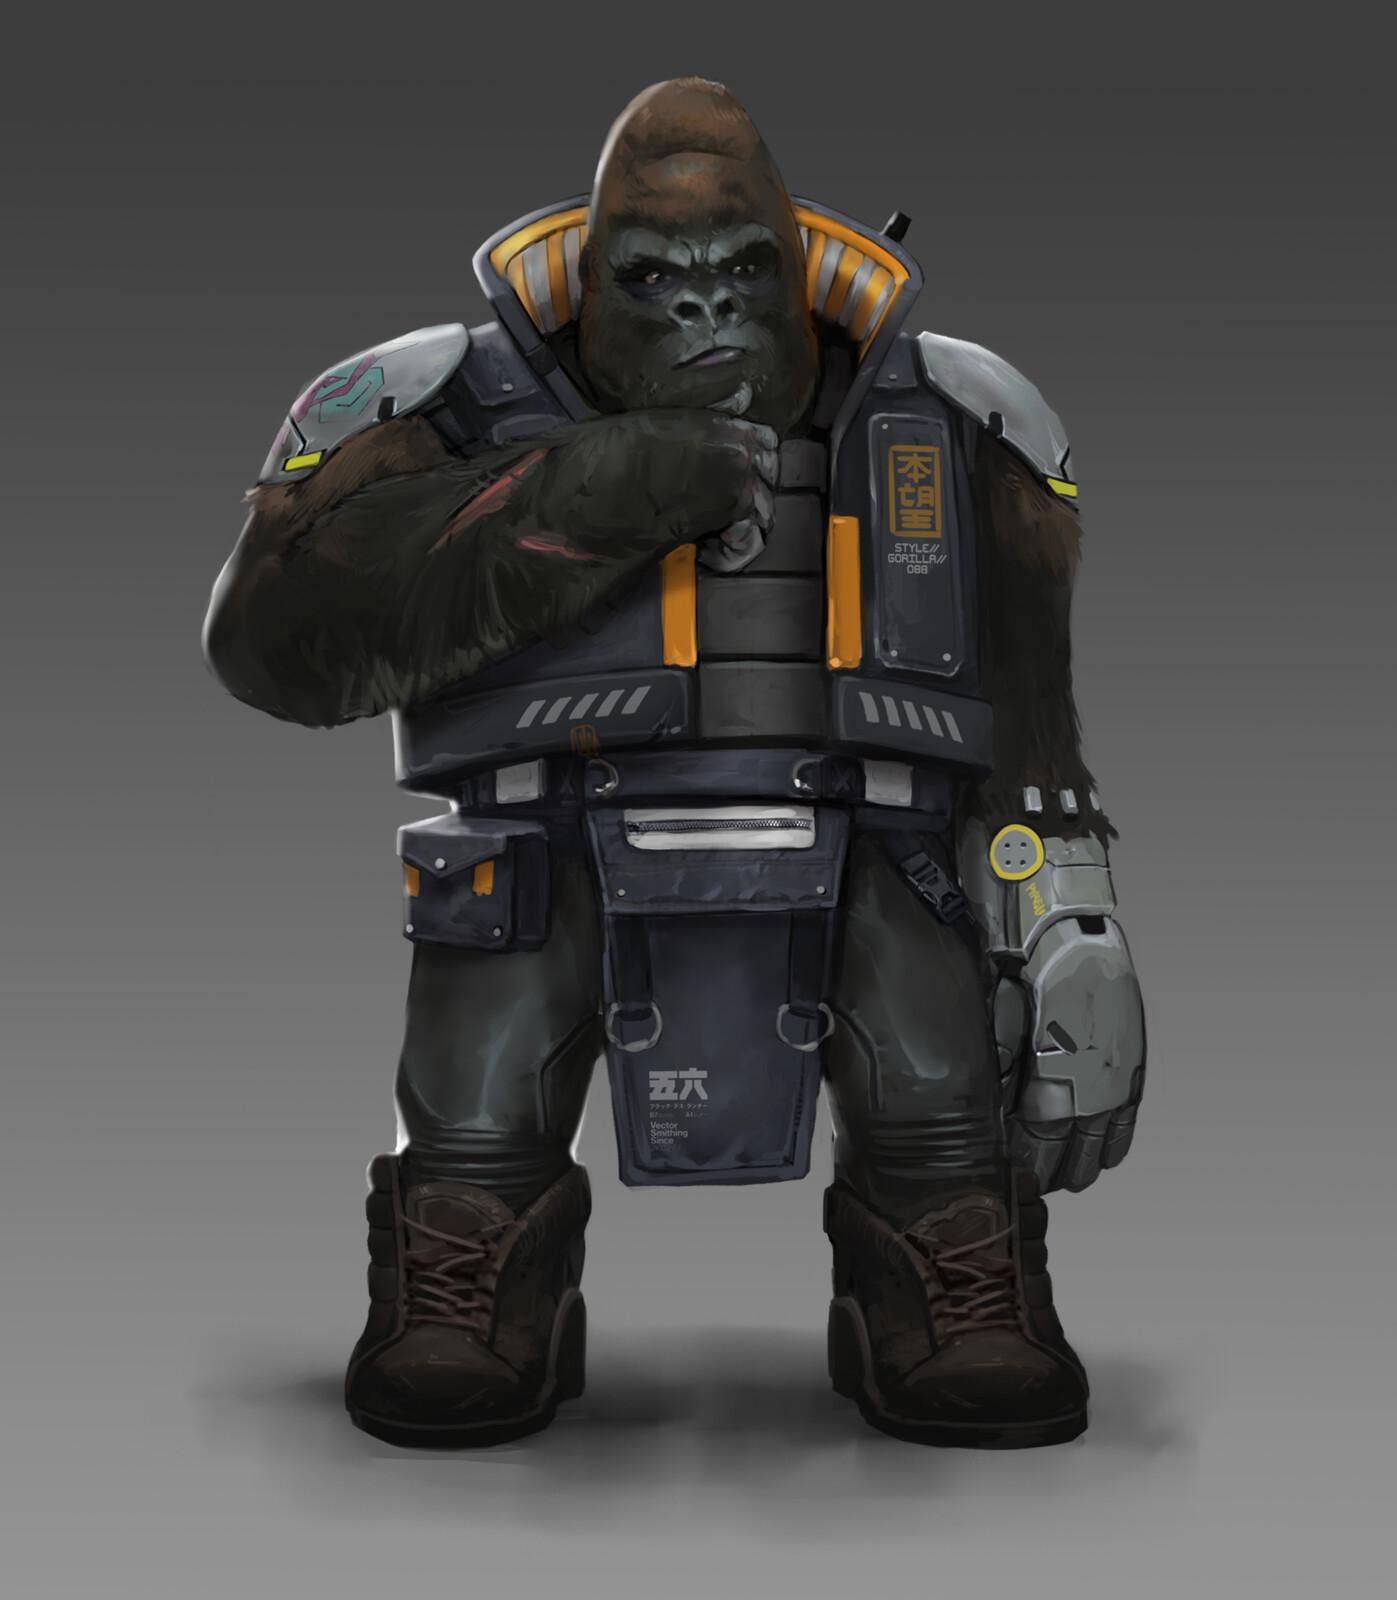 Cyber Punk Gorilla